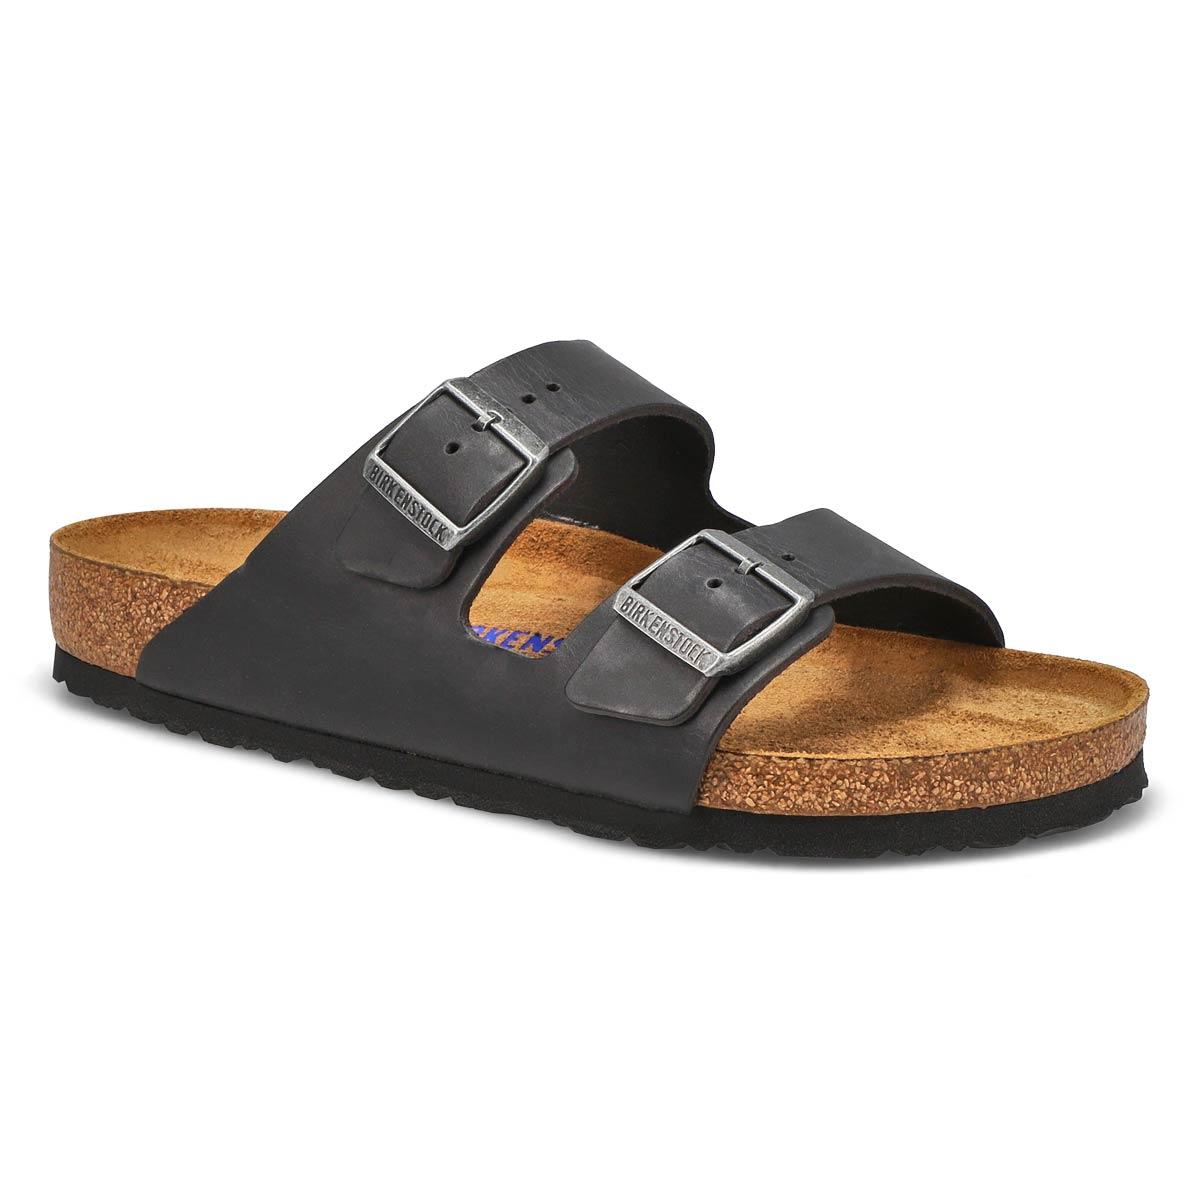 Men's Arizona Sf Black 2 Strap Sandals by Birkenstock